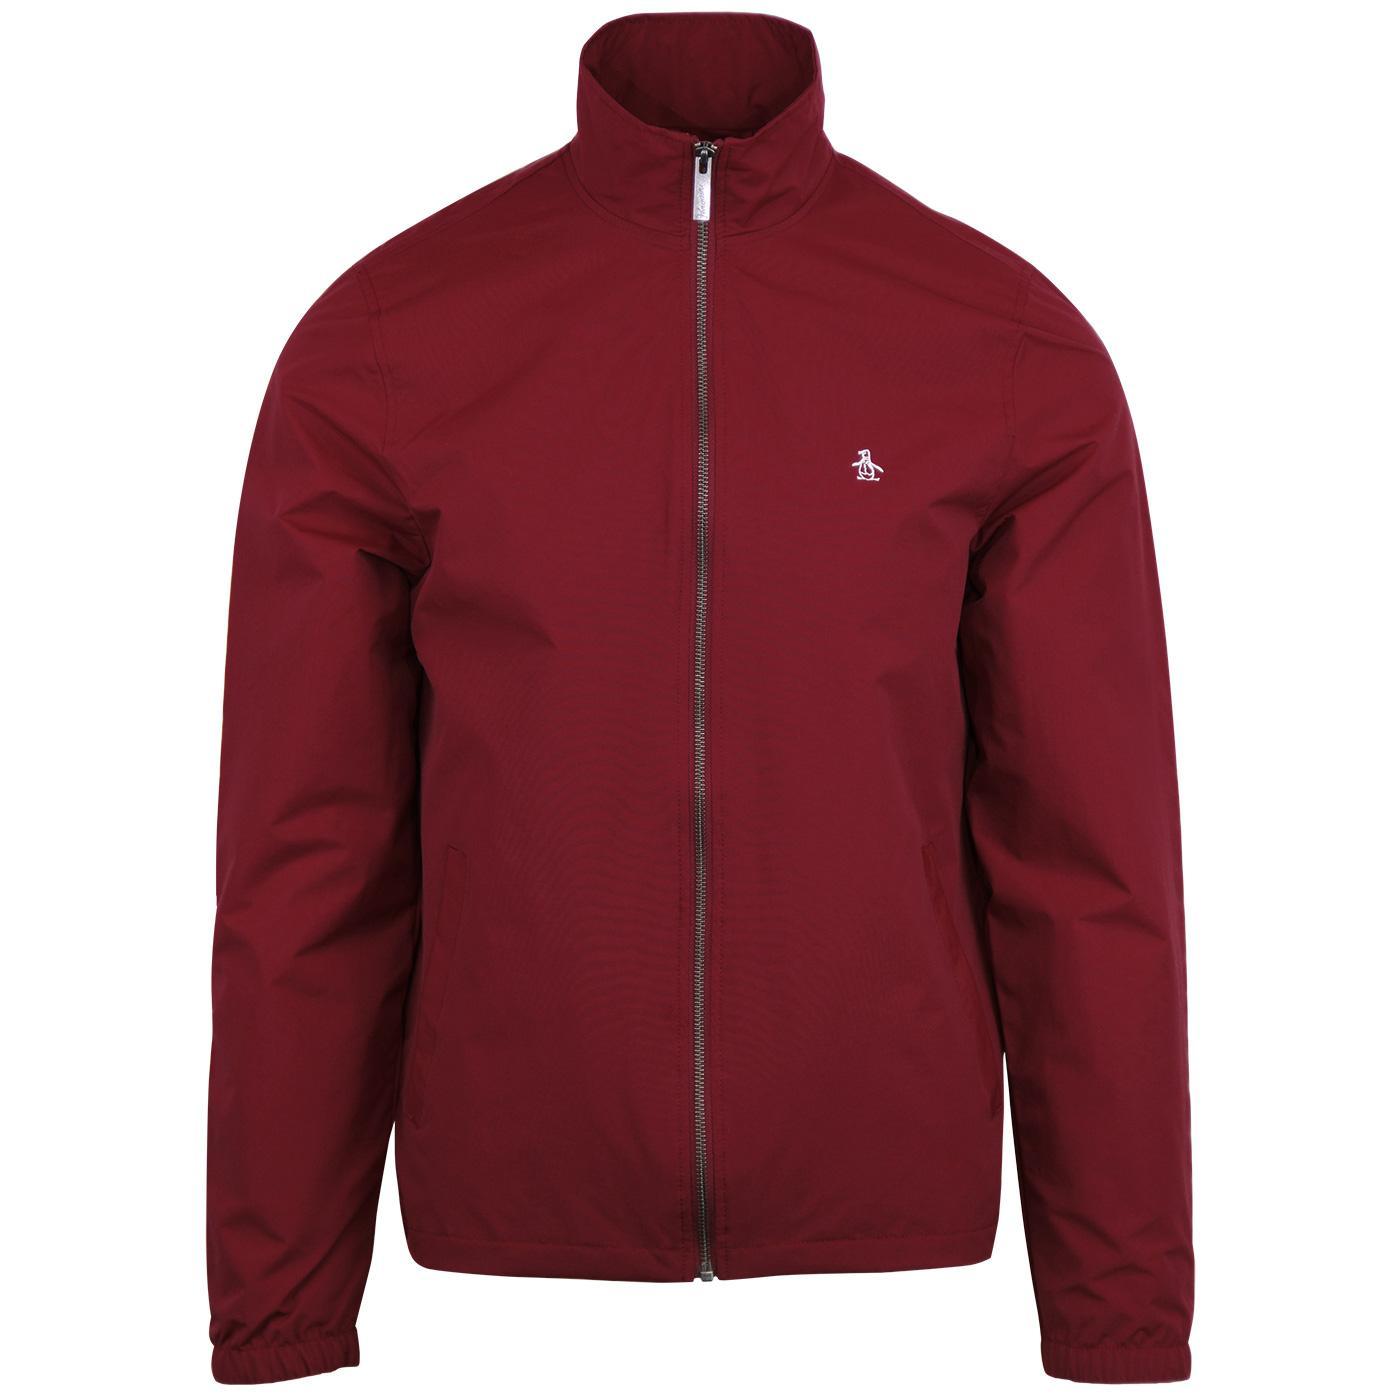 ORIGINAL PENGUIN Retro Windcheater Jacket - Red